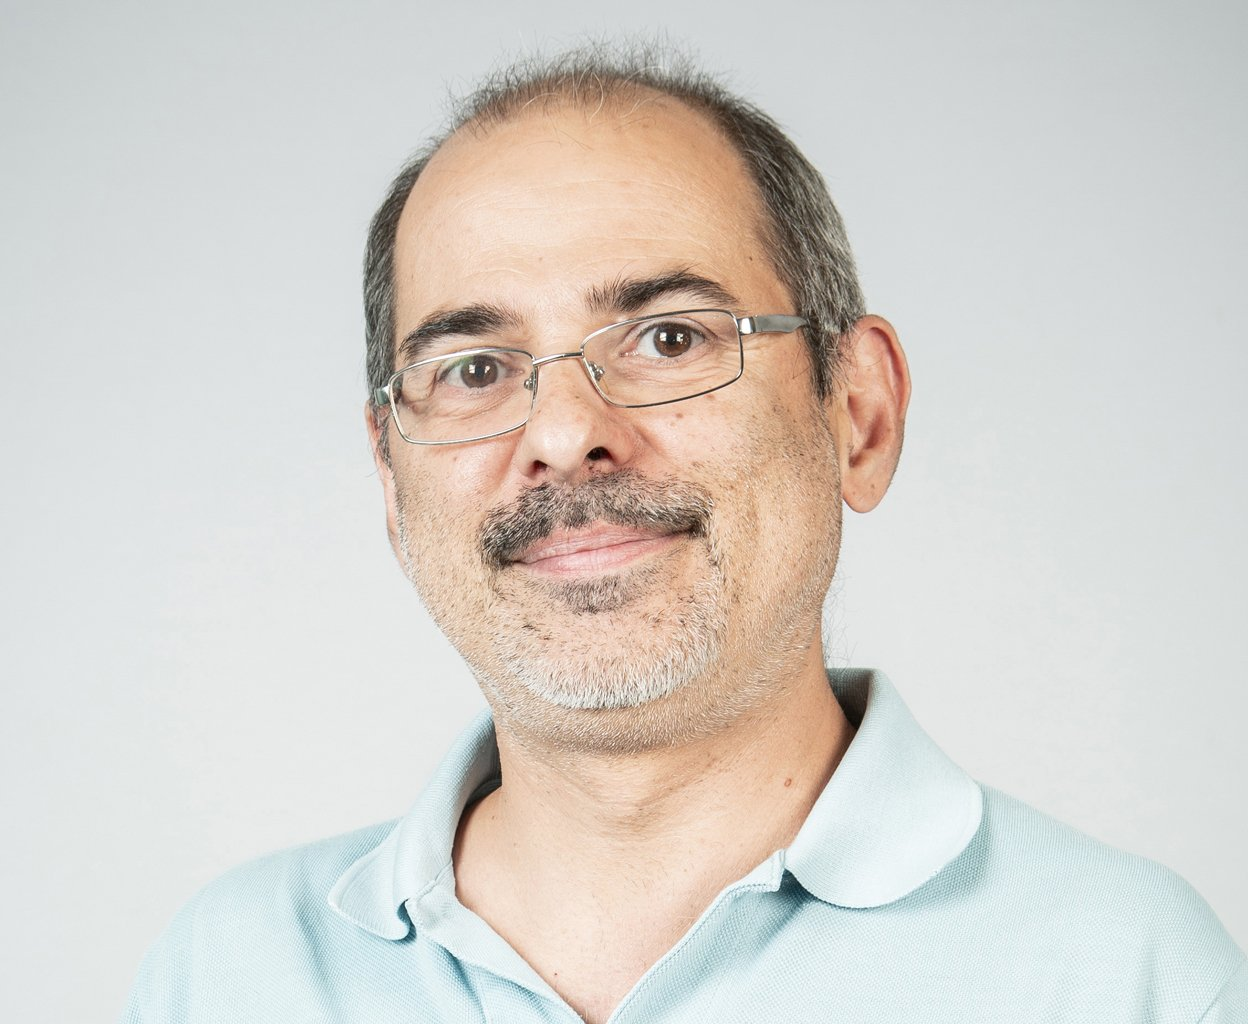 Andrea Pescarolo